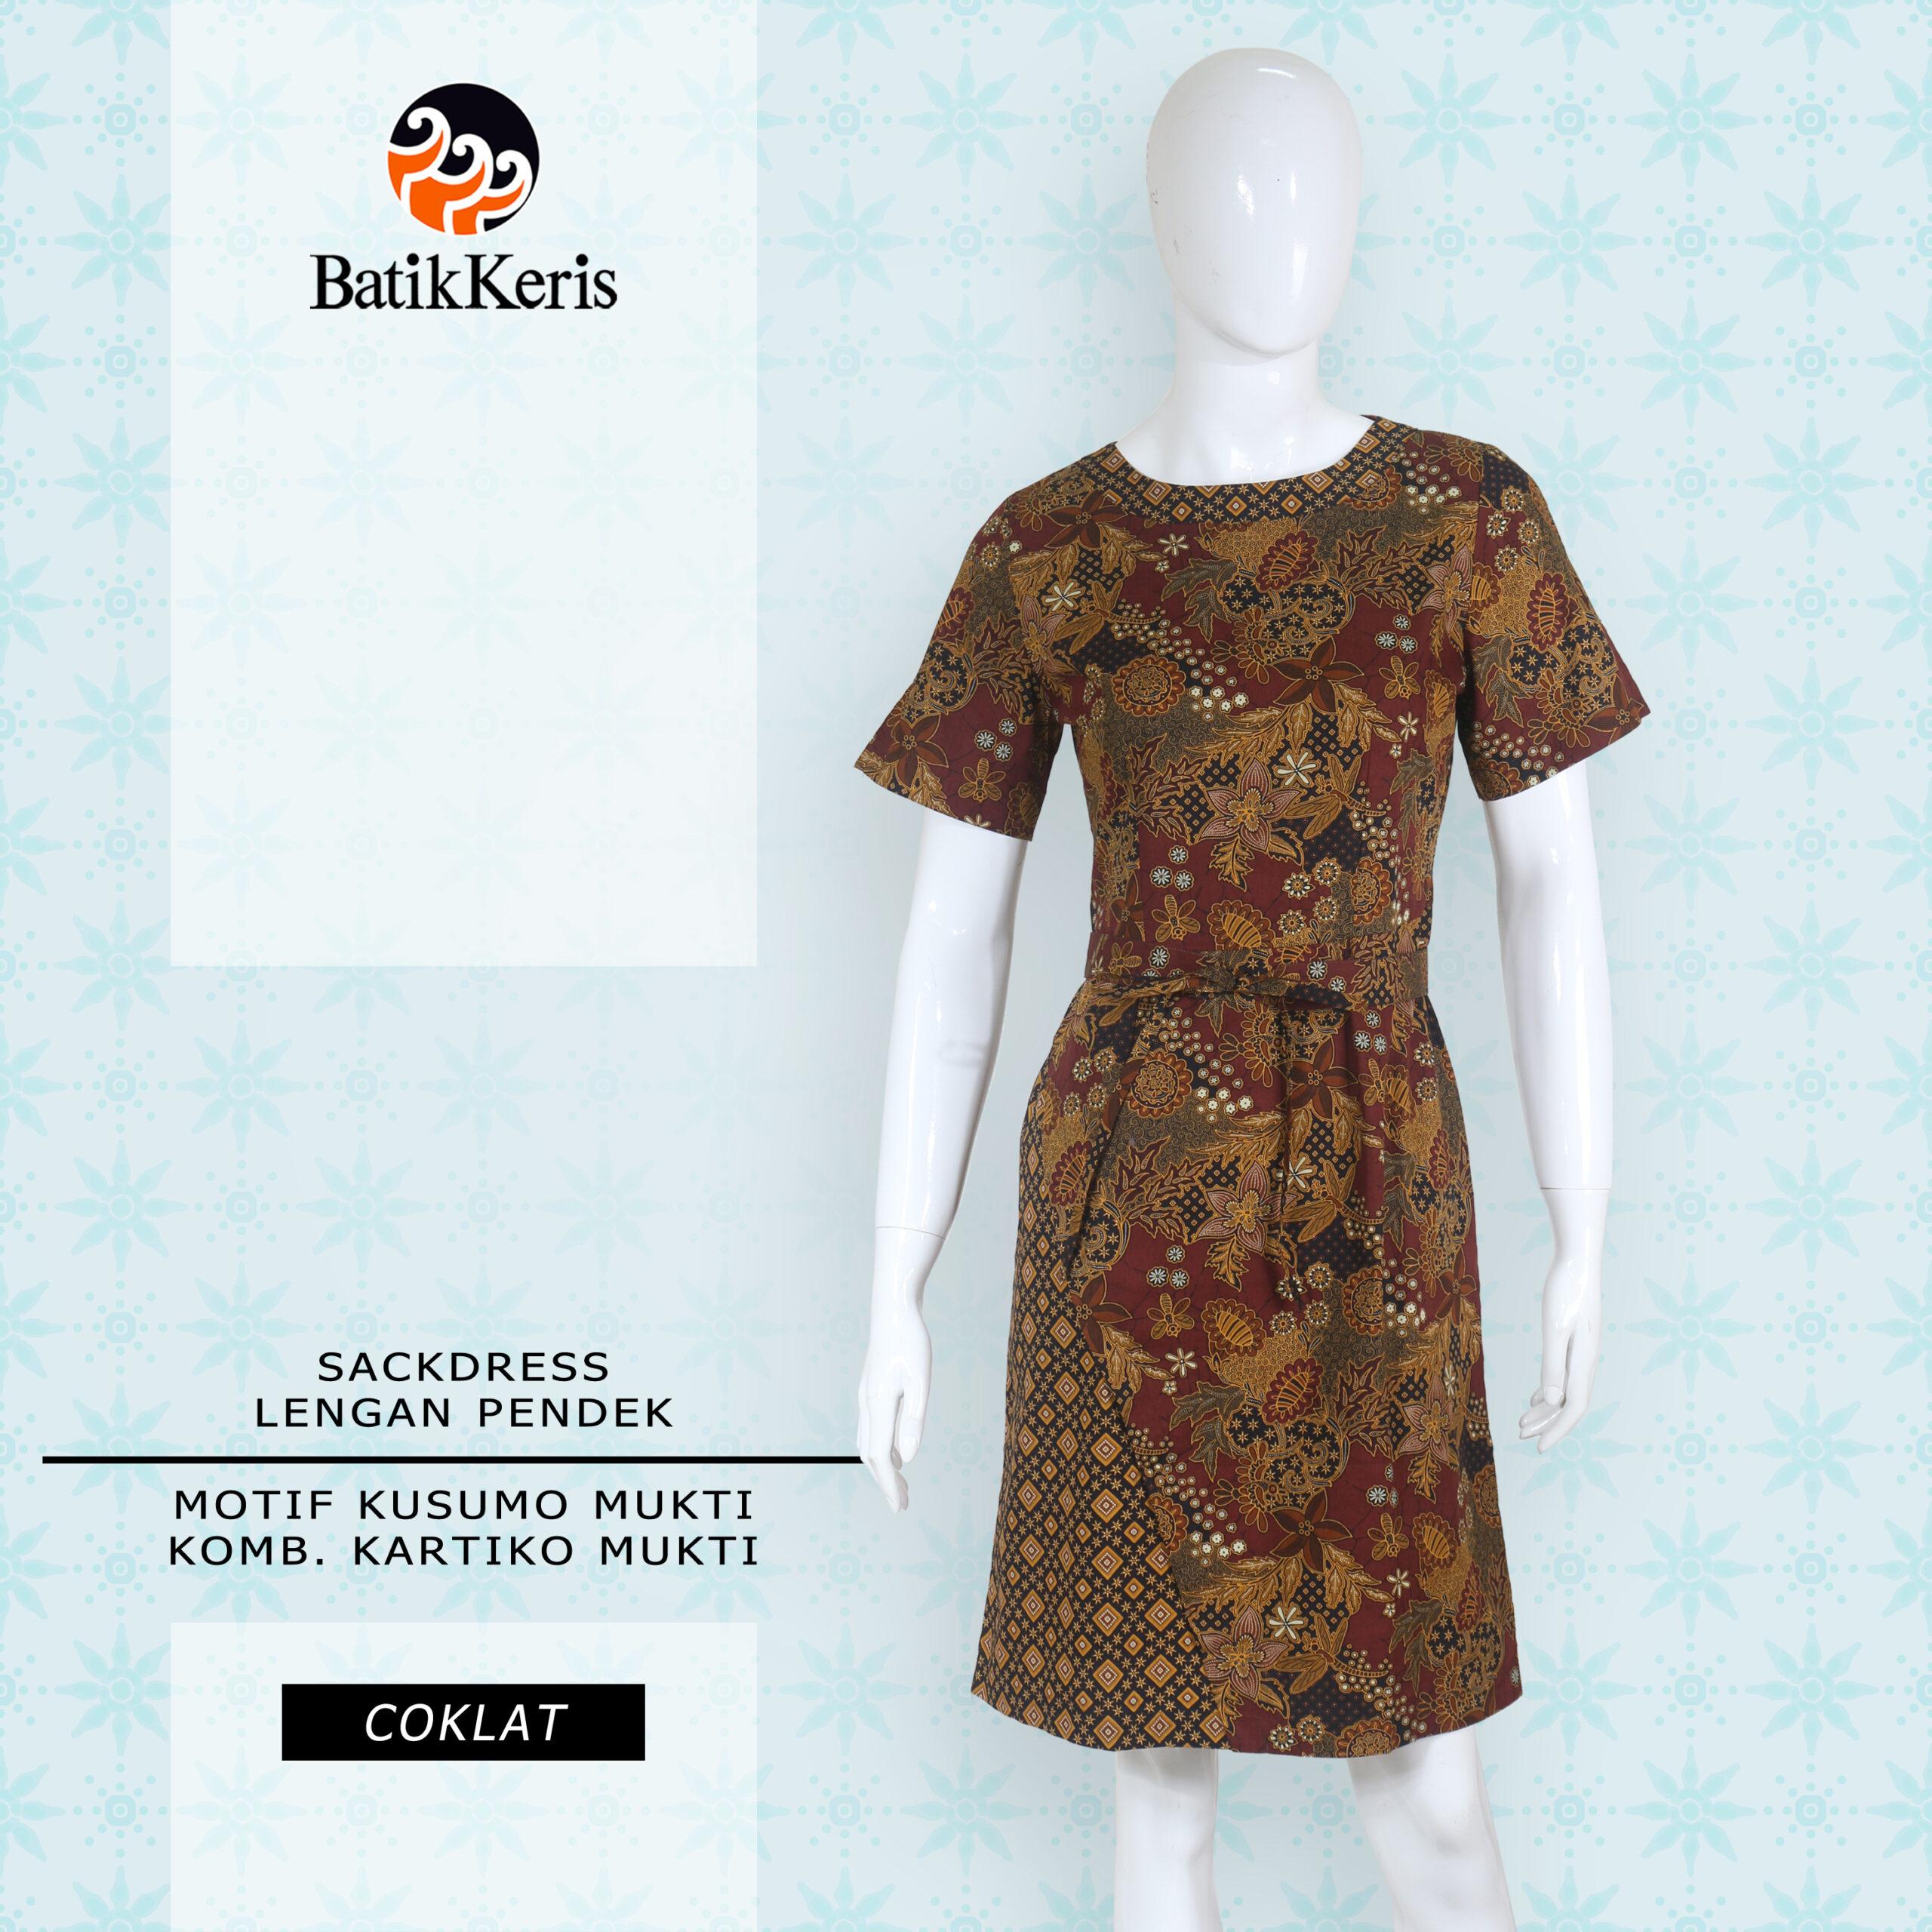 Kusumo Mukti DRESS Coklat Pendek DEPAN_2